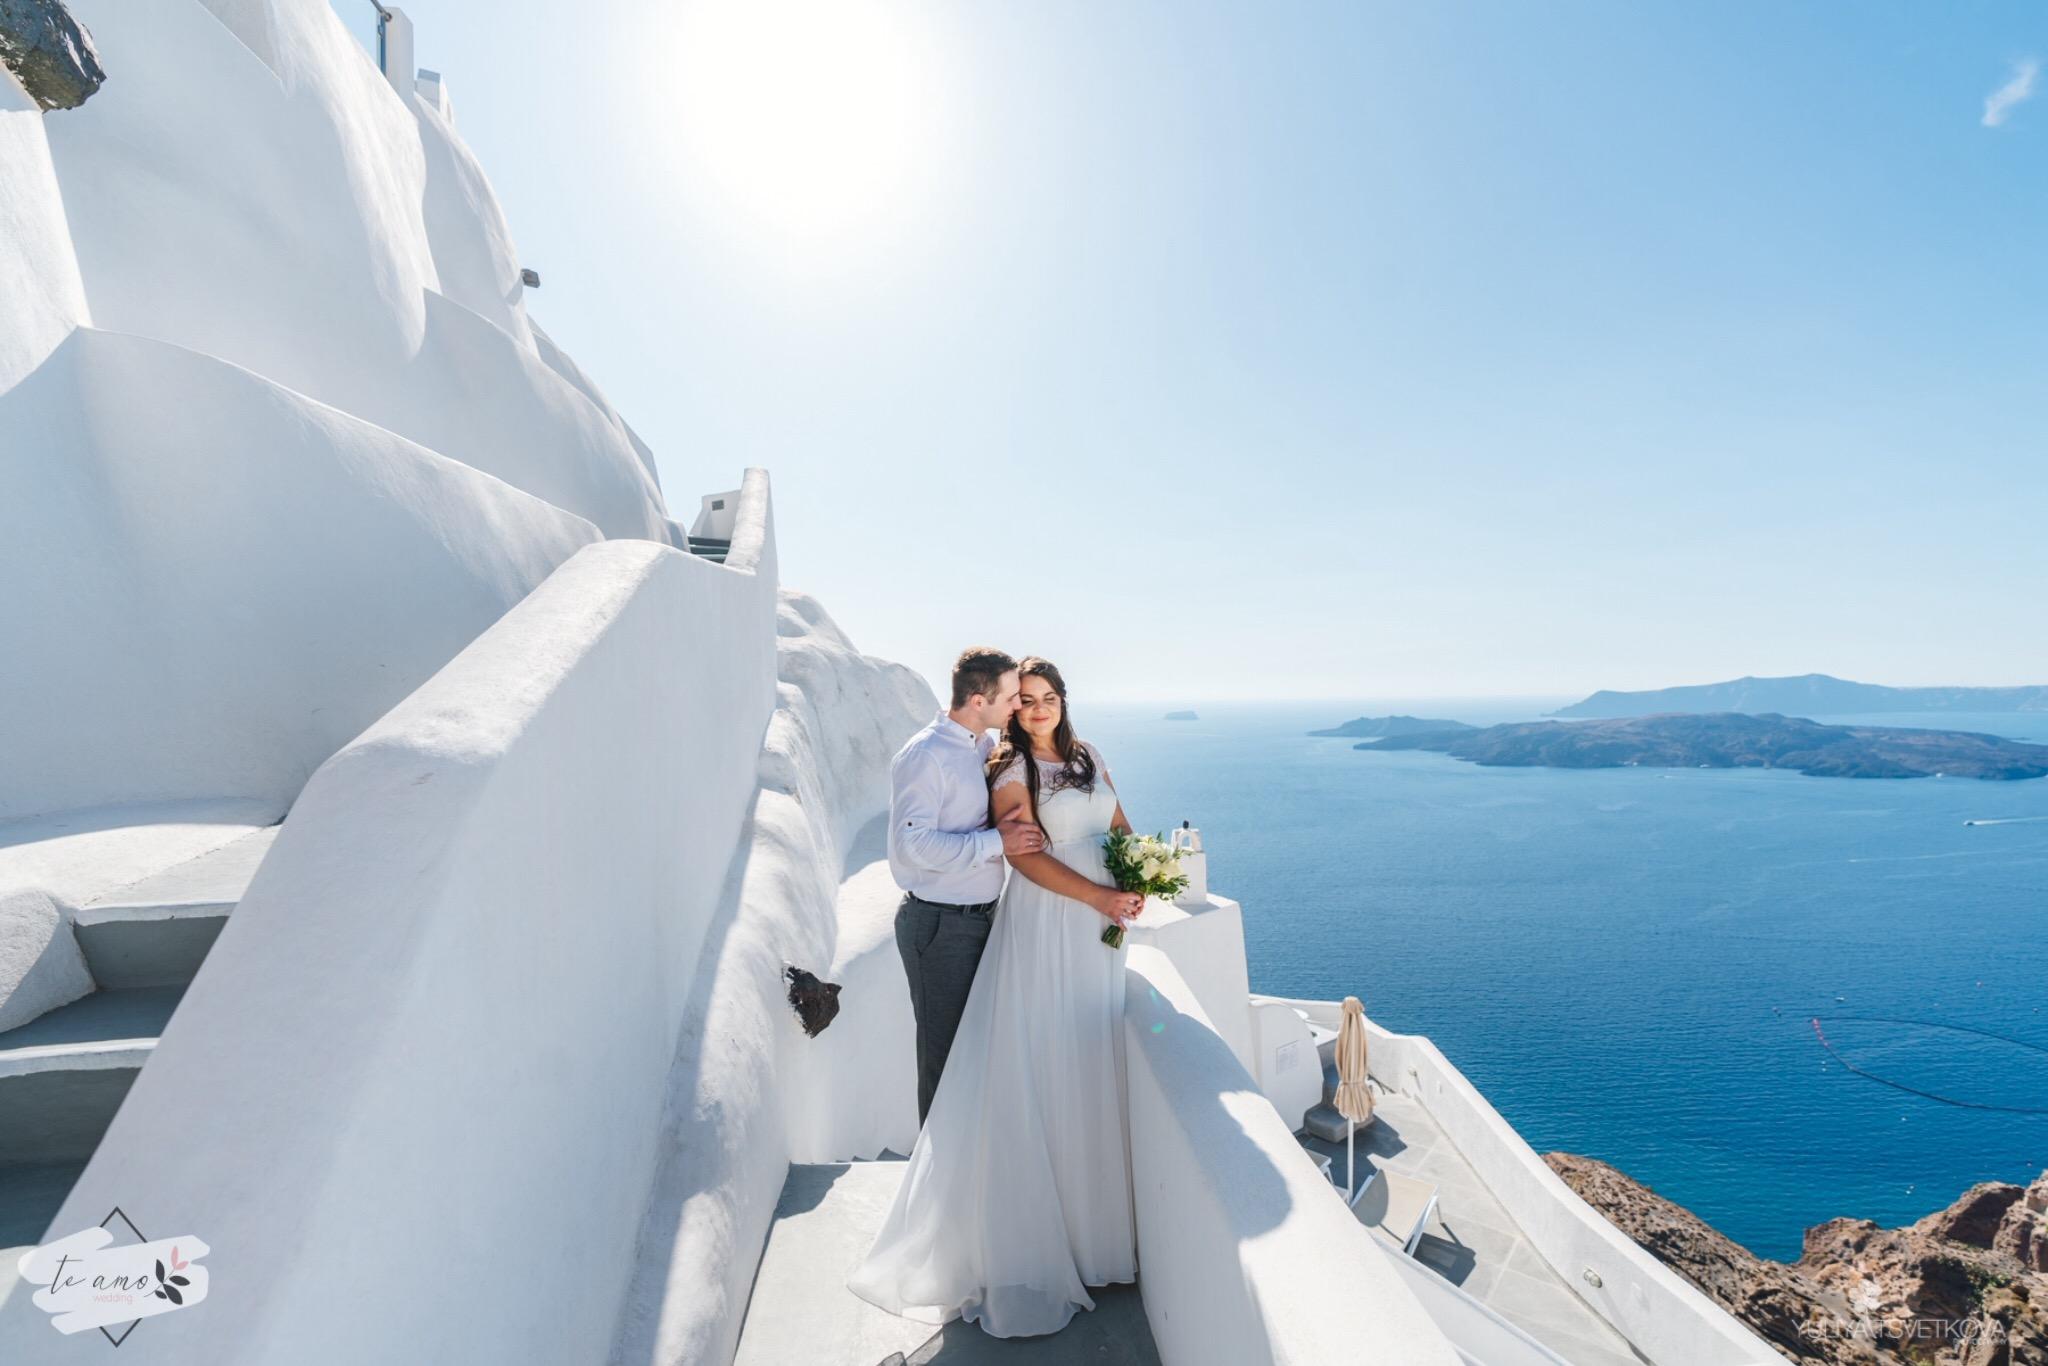 A & I | Te Amo Wedding